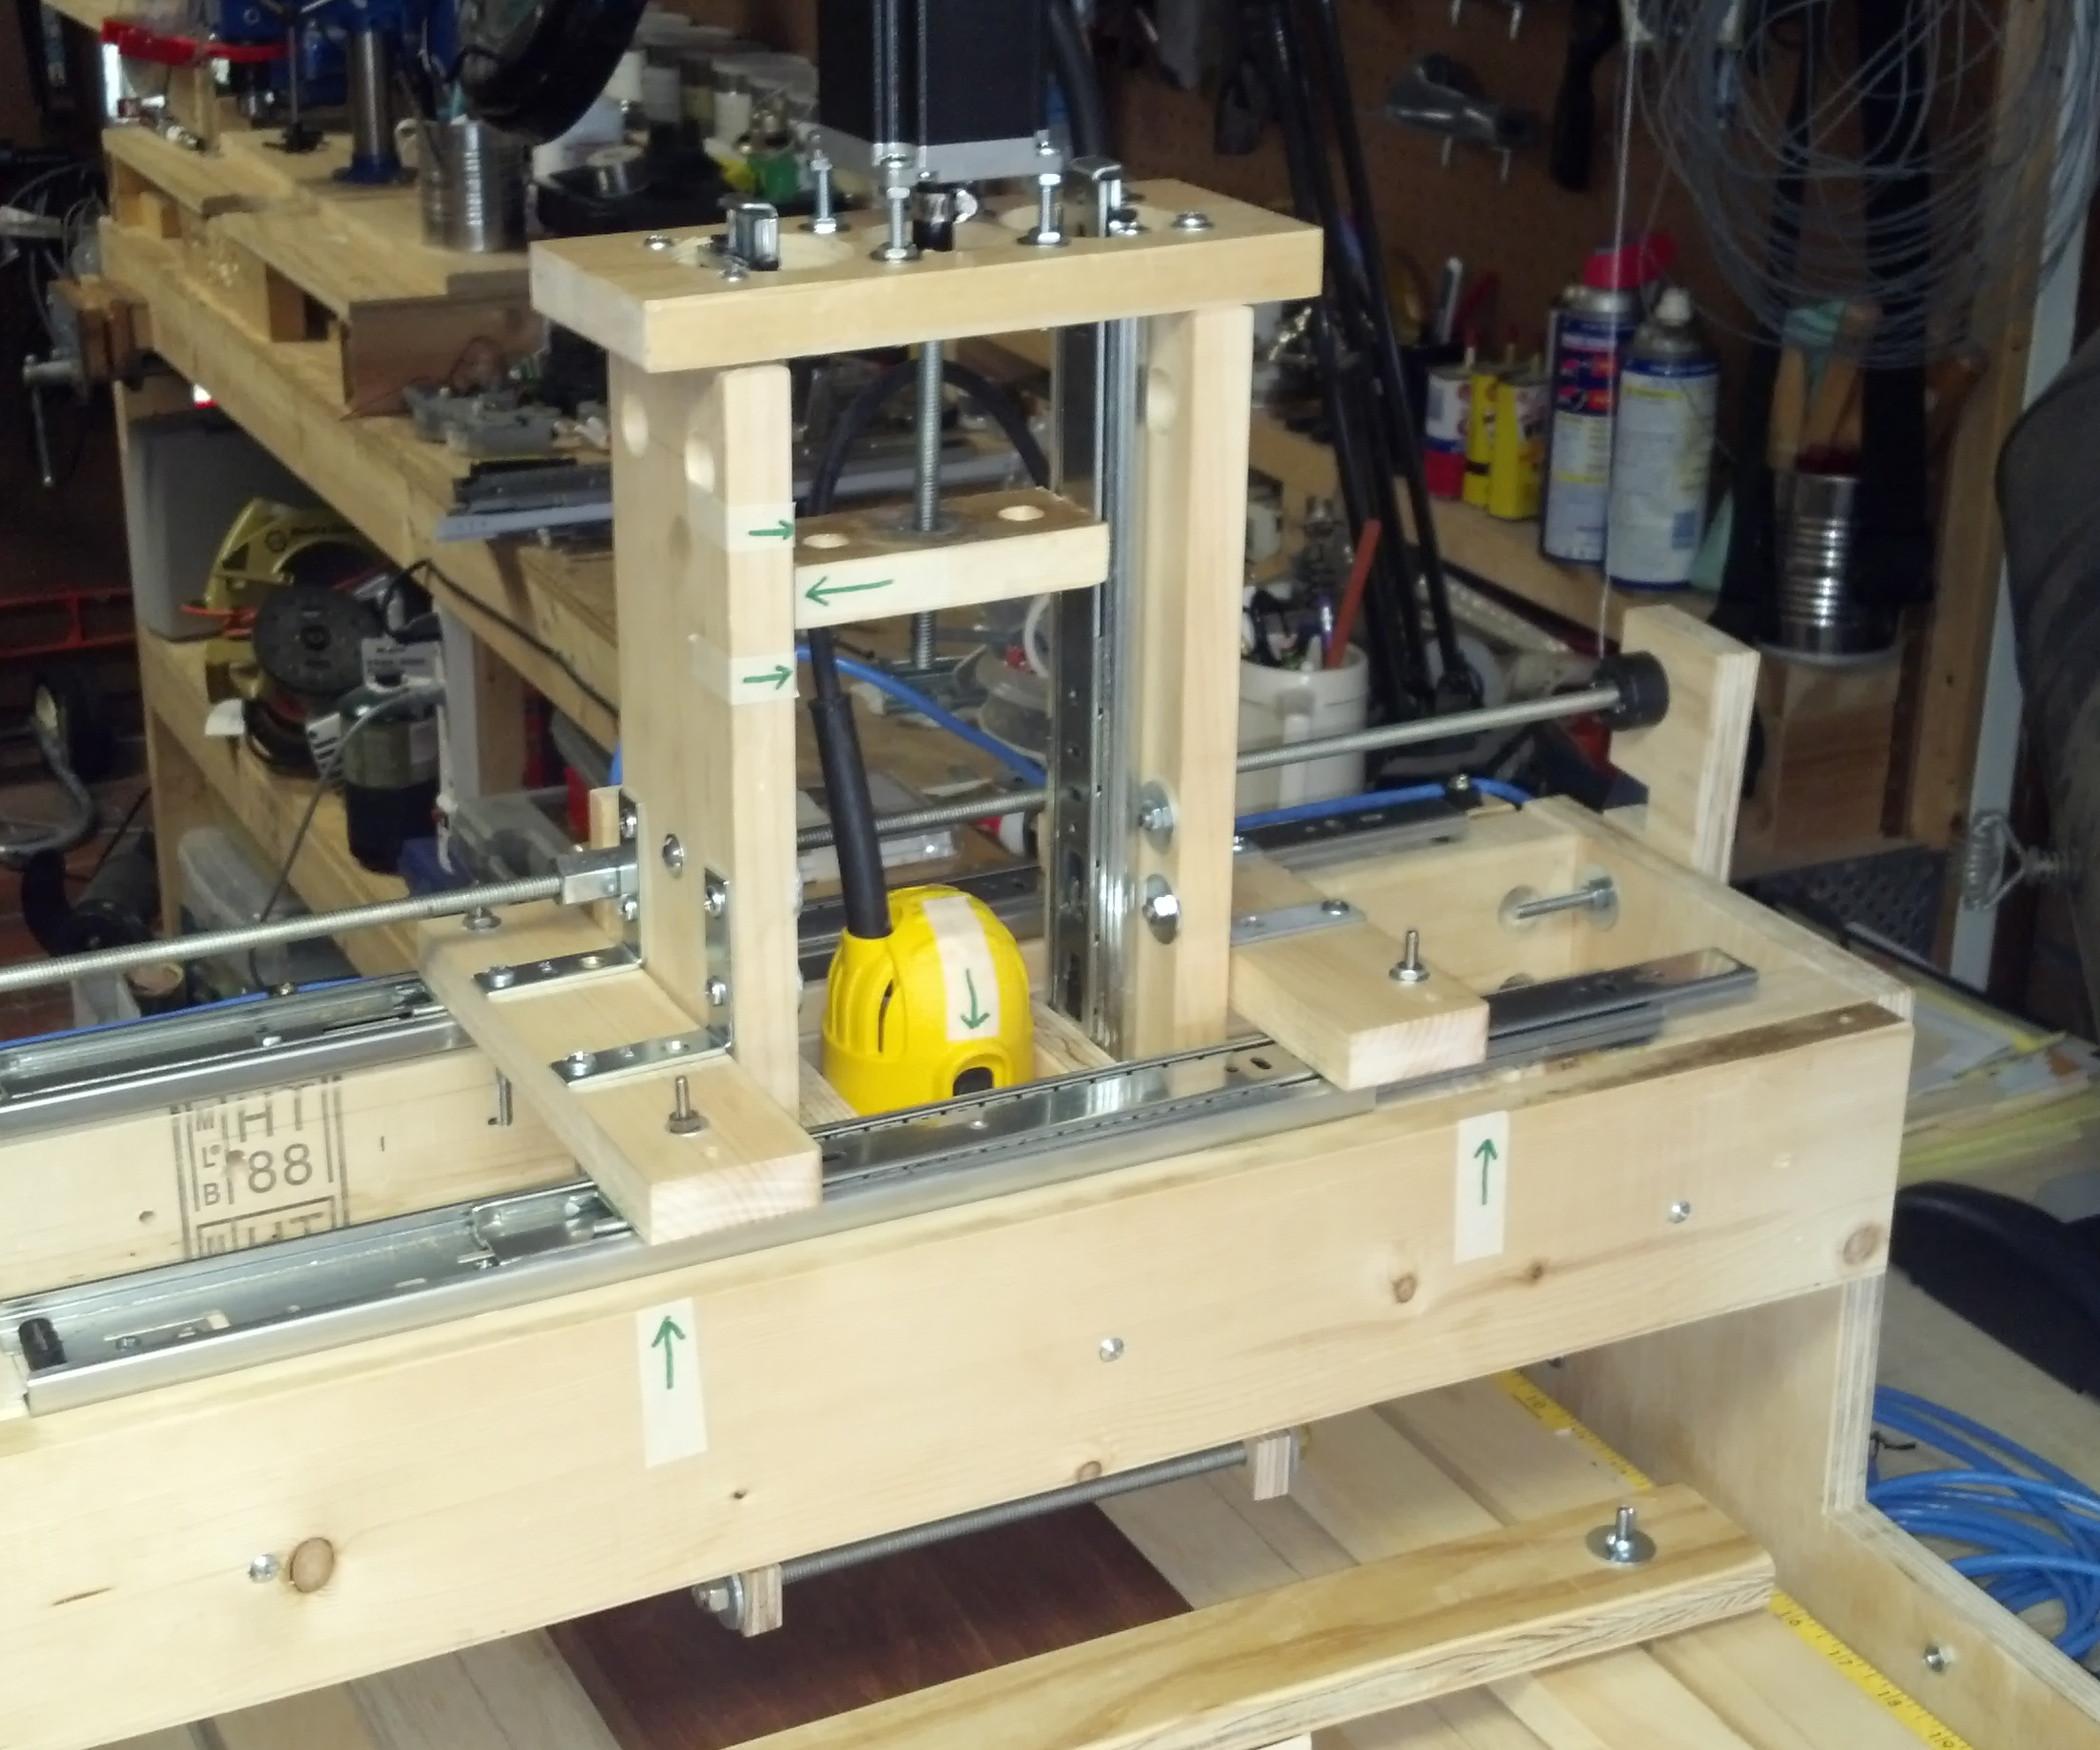 Best ideas about DIY Cnc Machine . Save or Pin DIY Drawerslide CNC Machine Gantry Re design Now.